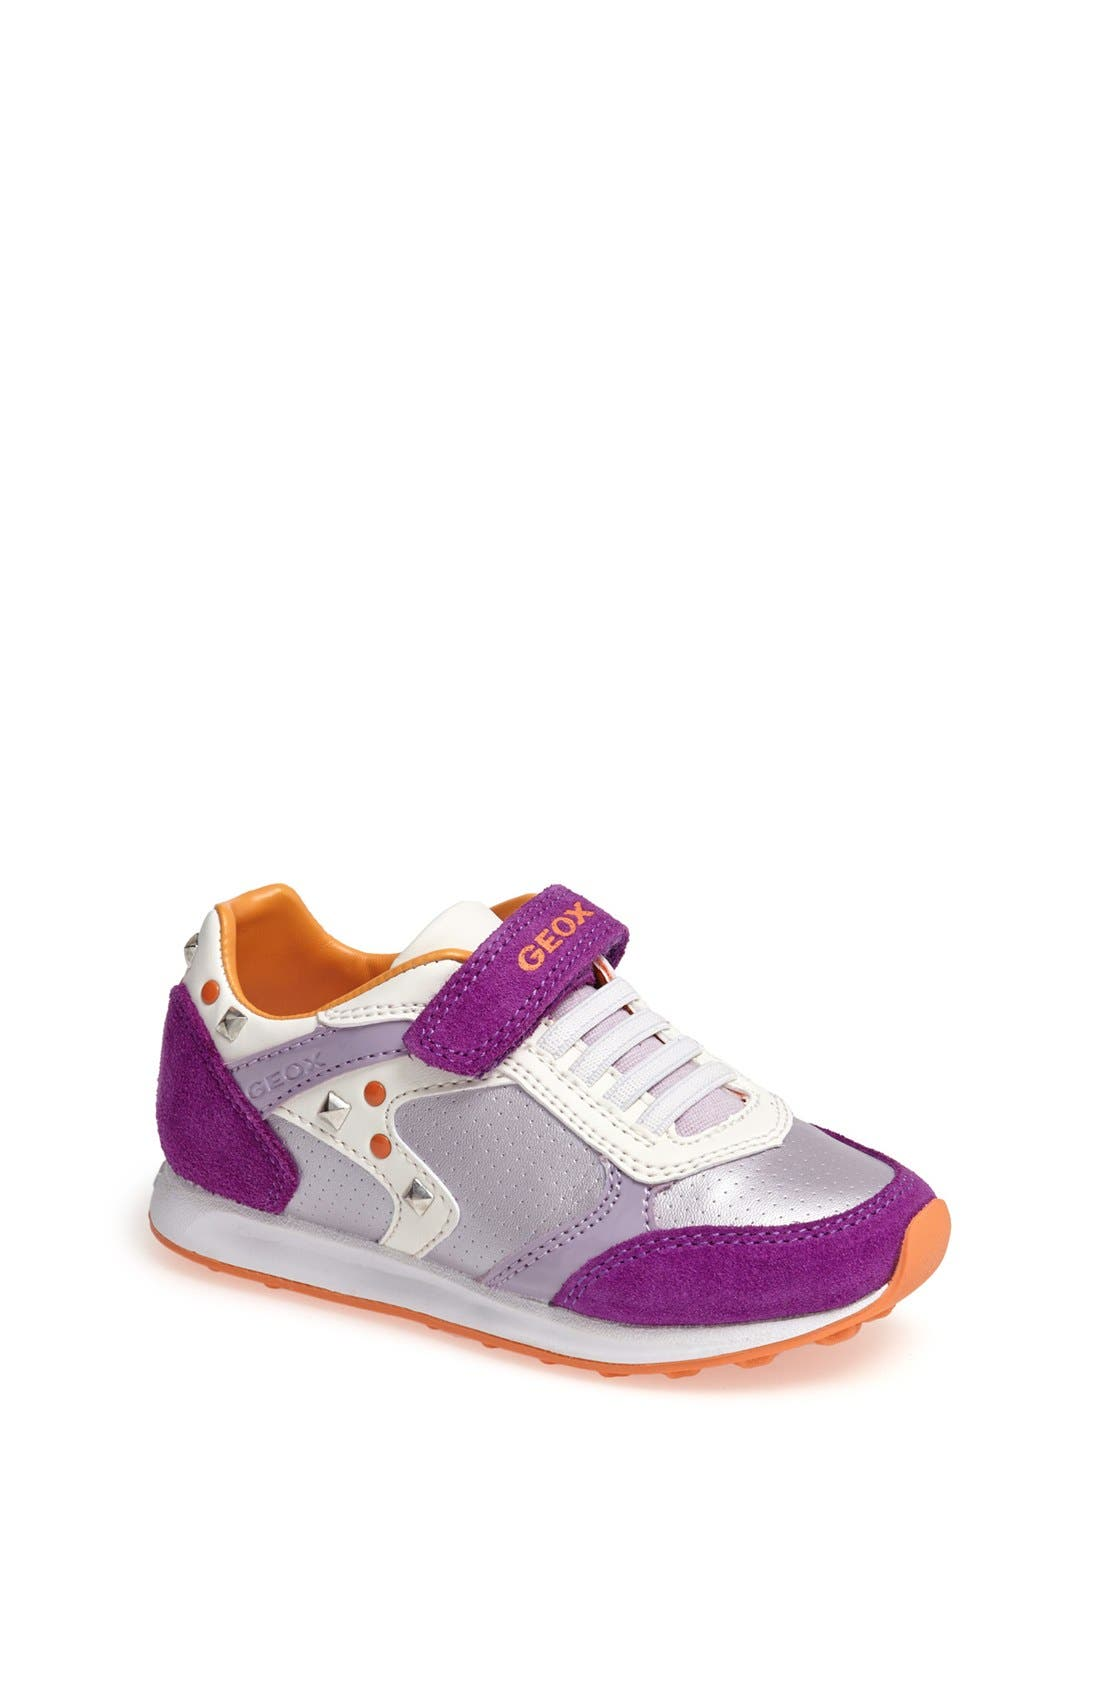 Alternate Image 1 Selected - Geox 'Elliot' Sneaker (Toddler & Little Kid)